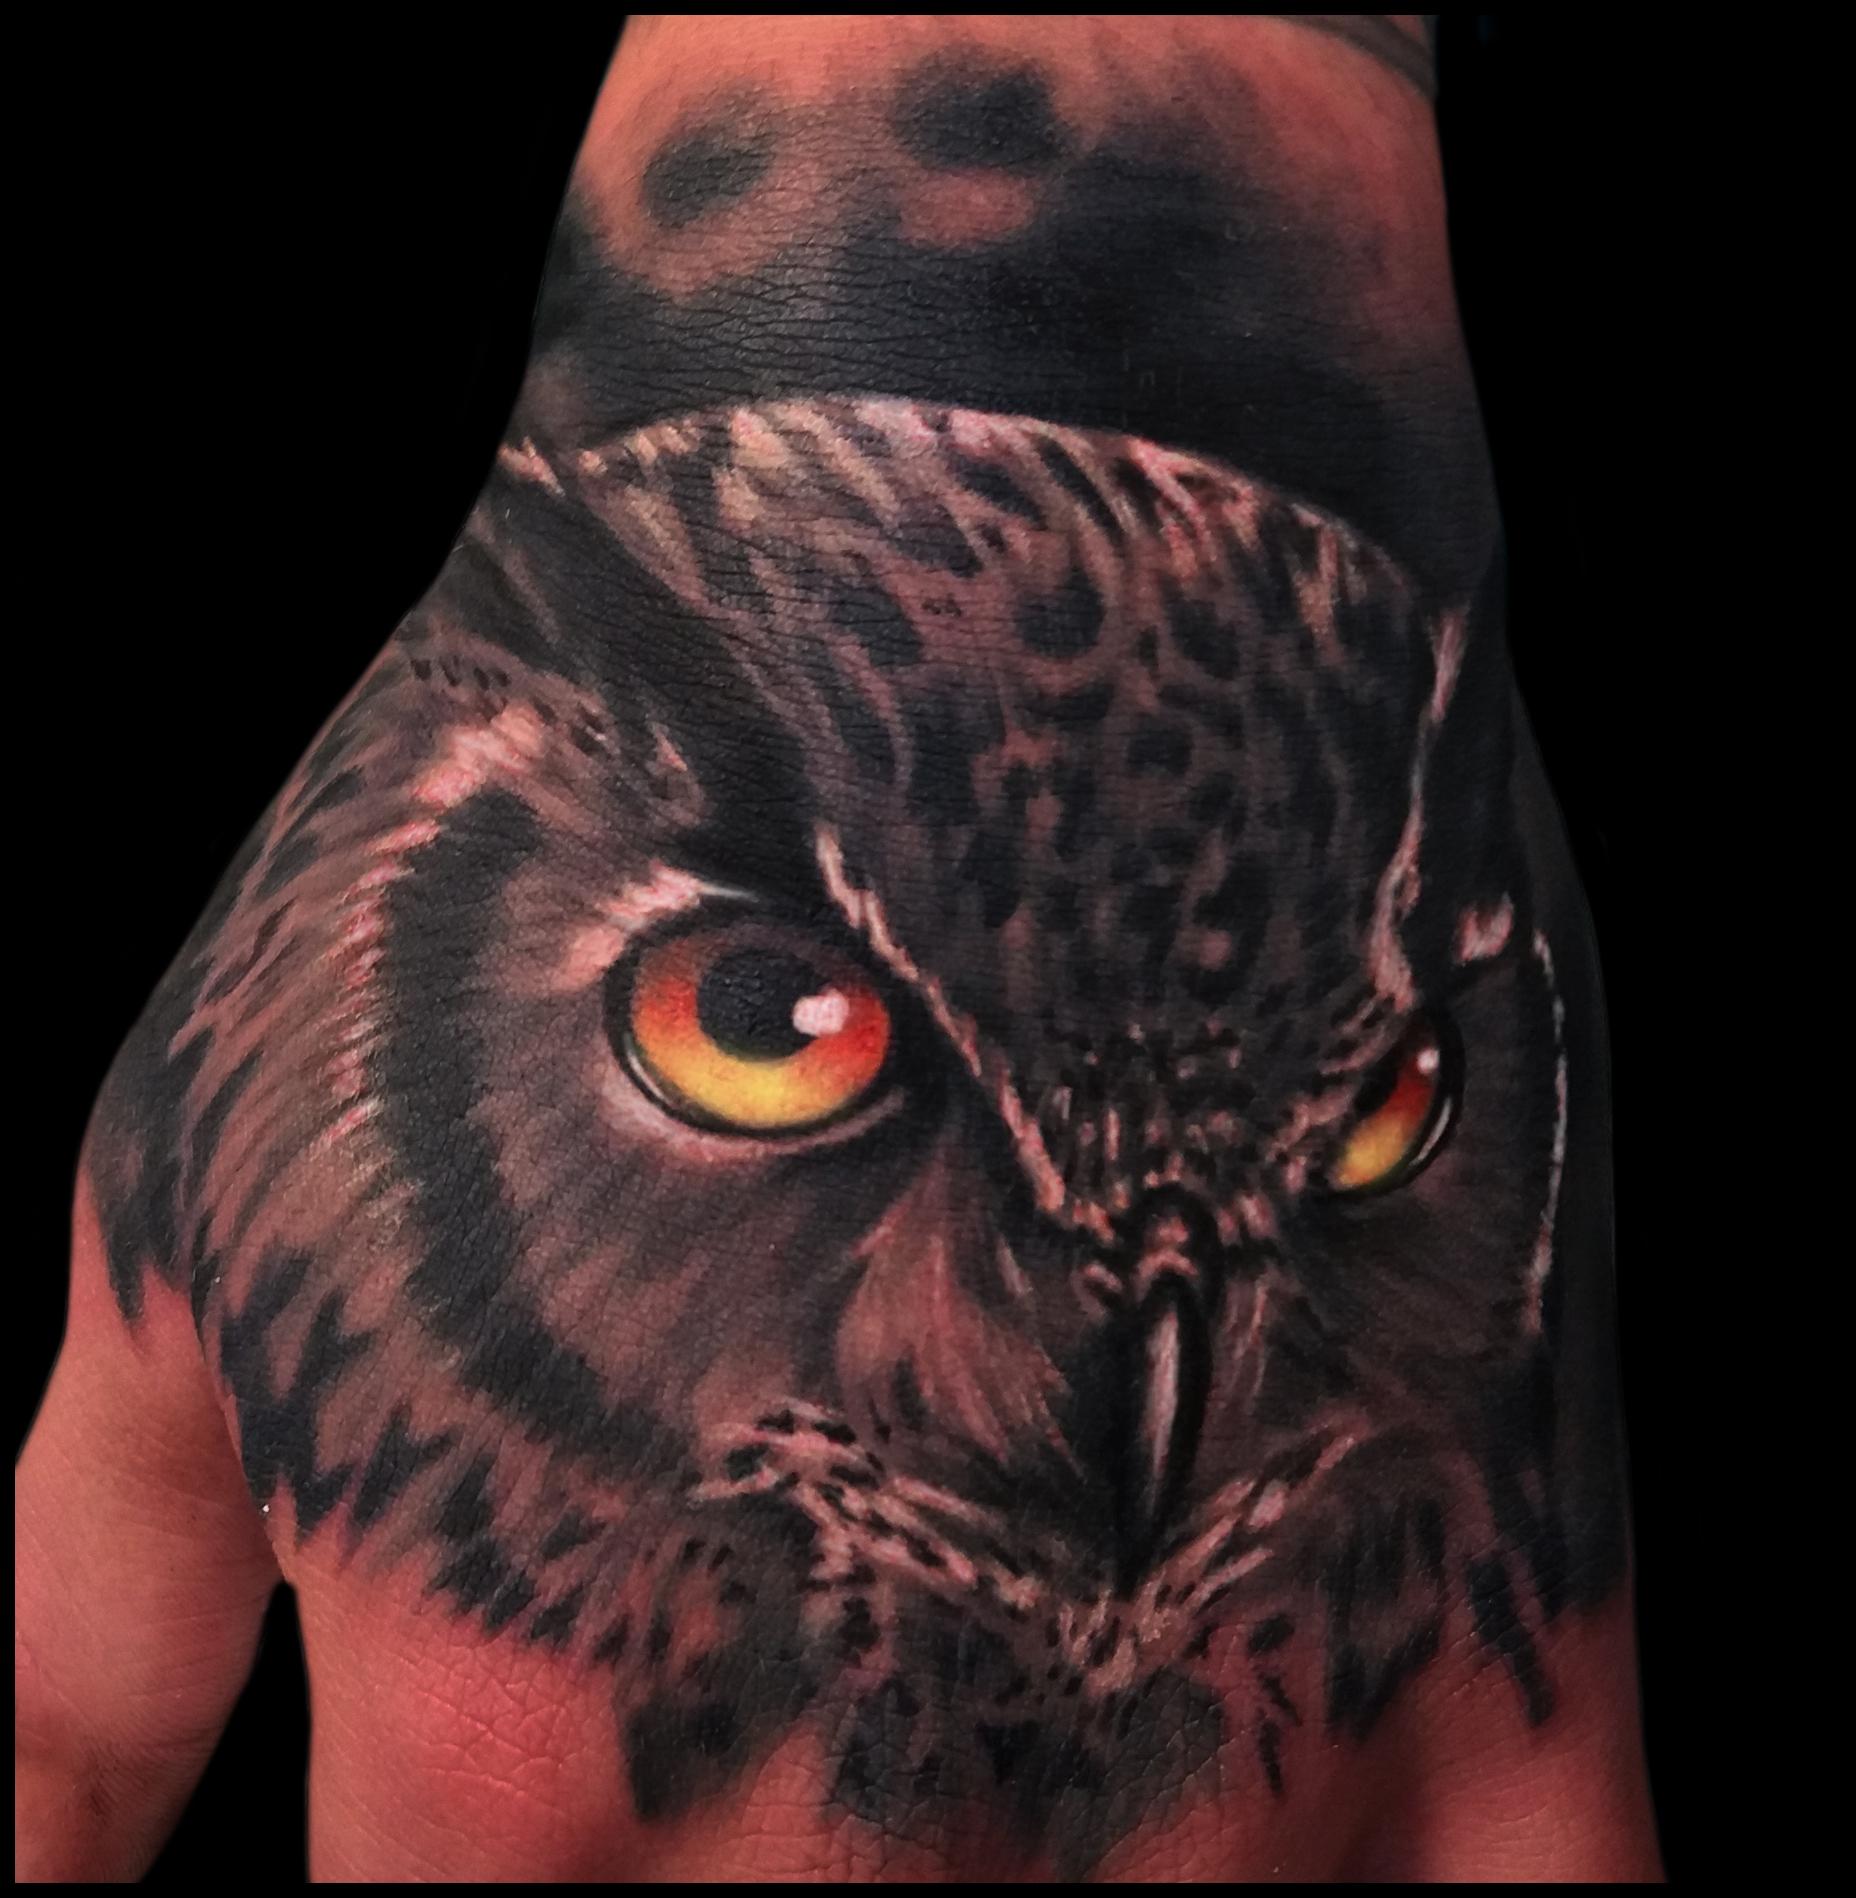 mano tatuada con búho